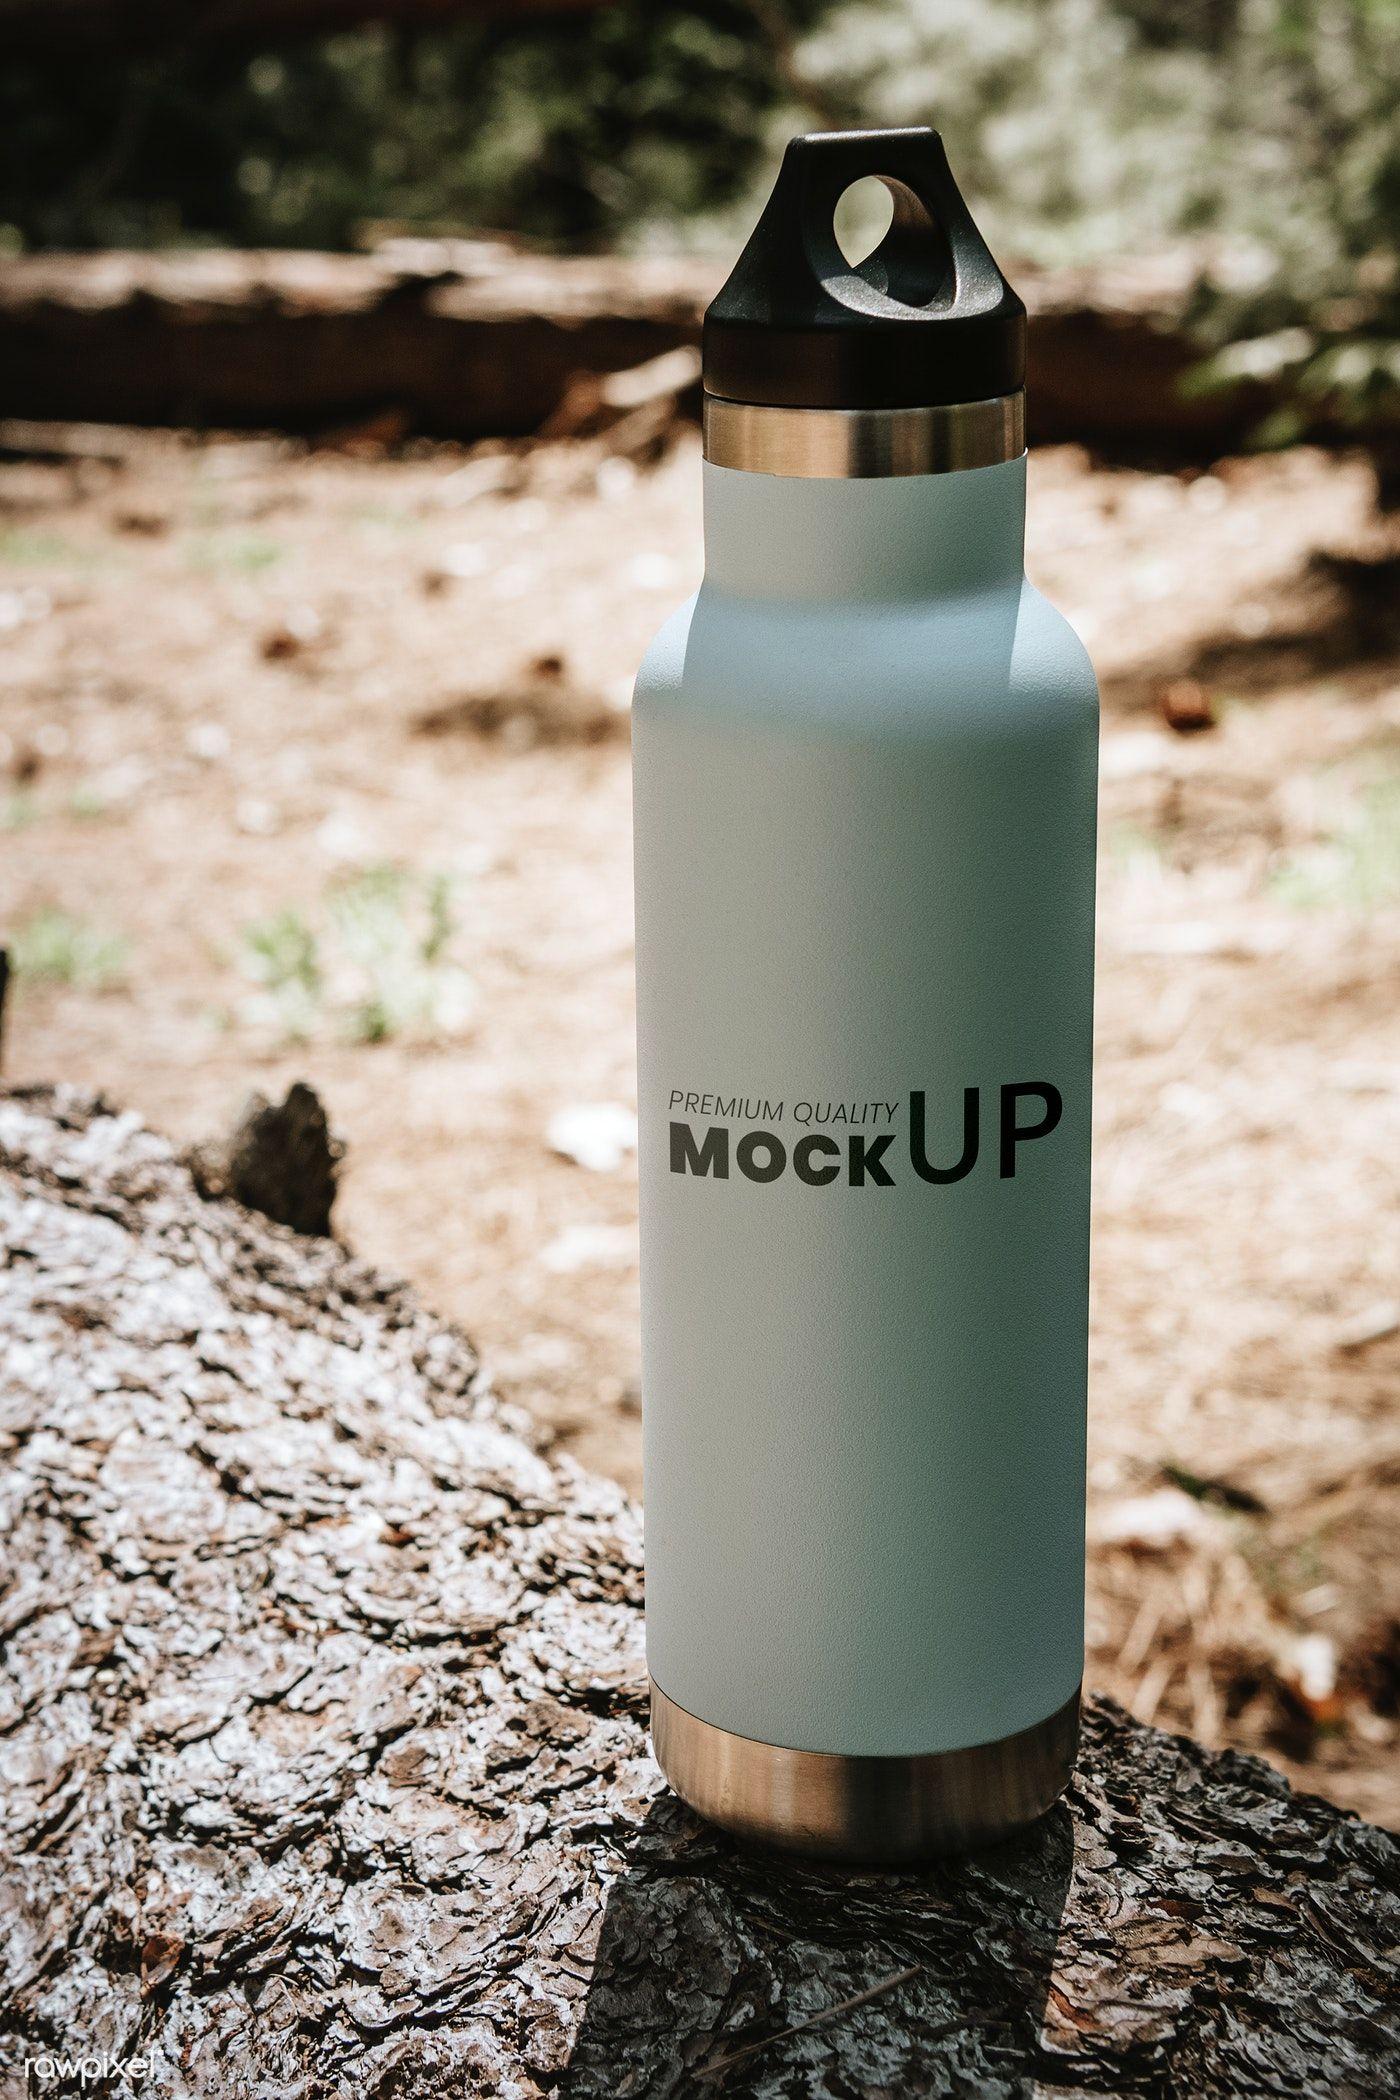 Download Premium Psd Of Water Bottle Mockup In The Forest 1221380 Bottle Mockup Water Bottle Bottle